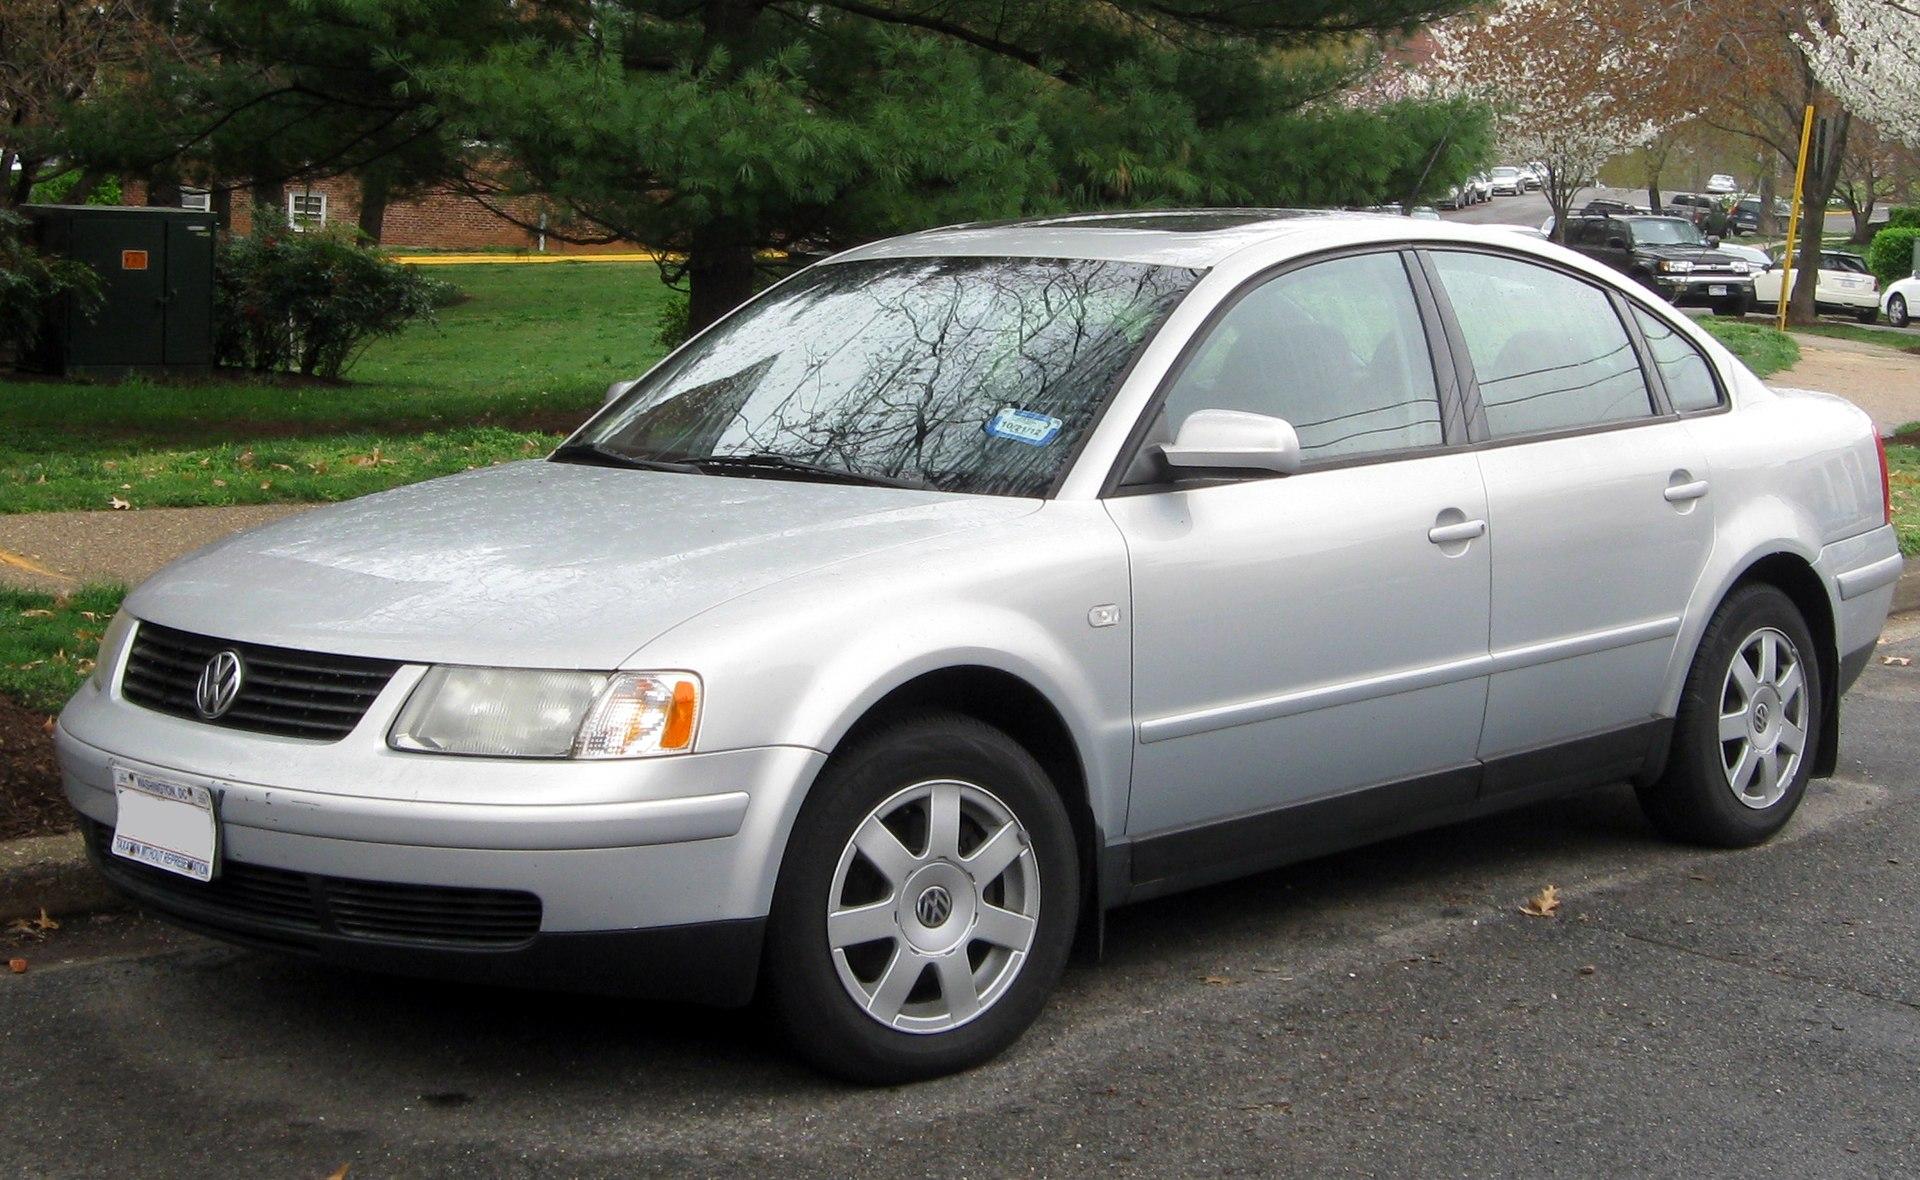 Volkswagen Passat (B5) - Wikipedia